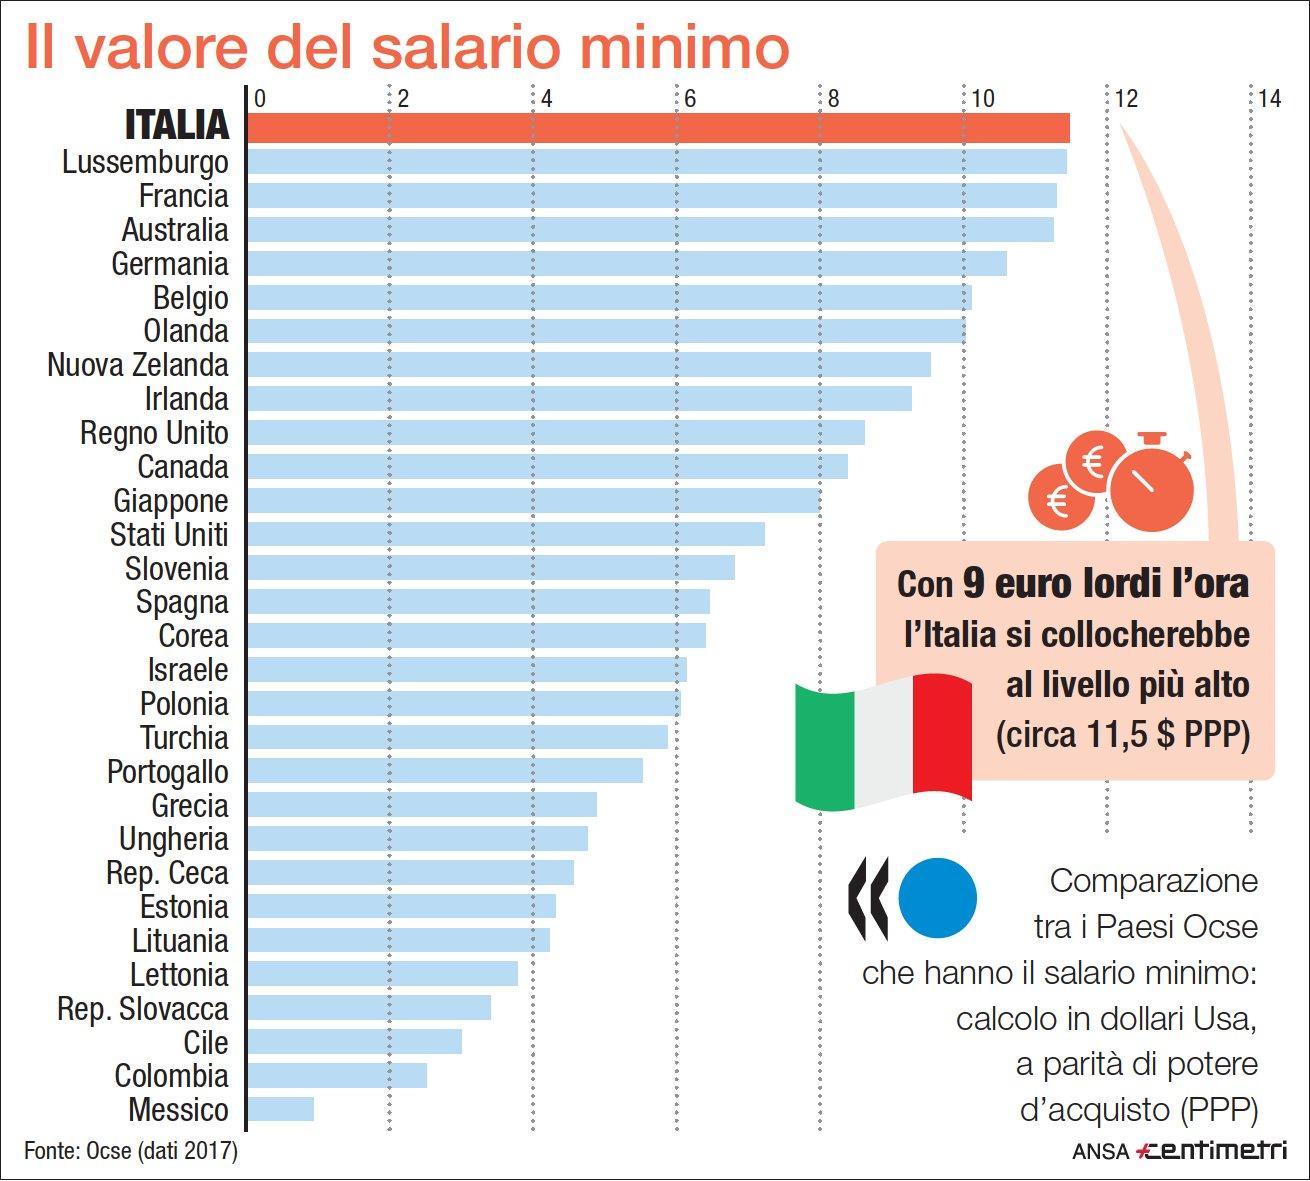 Salario orario minimo fissato a 9 euro lordi